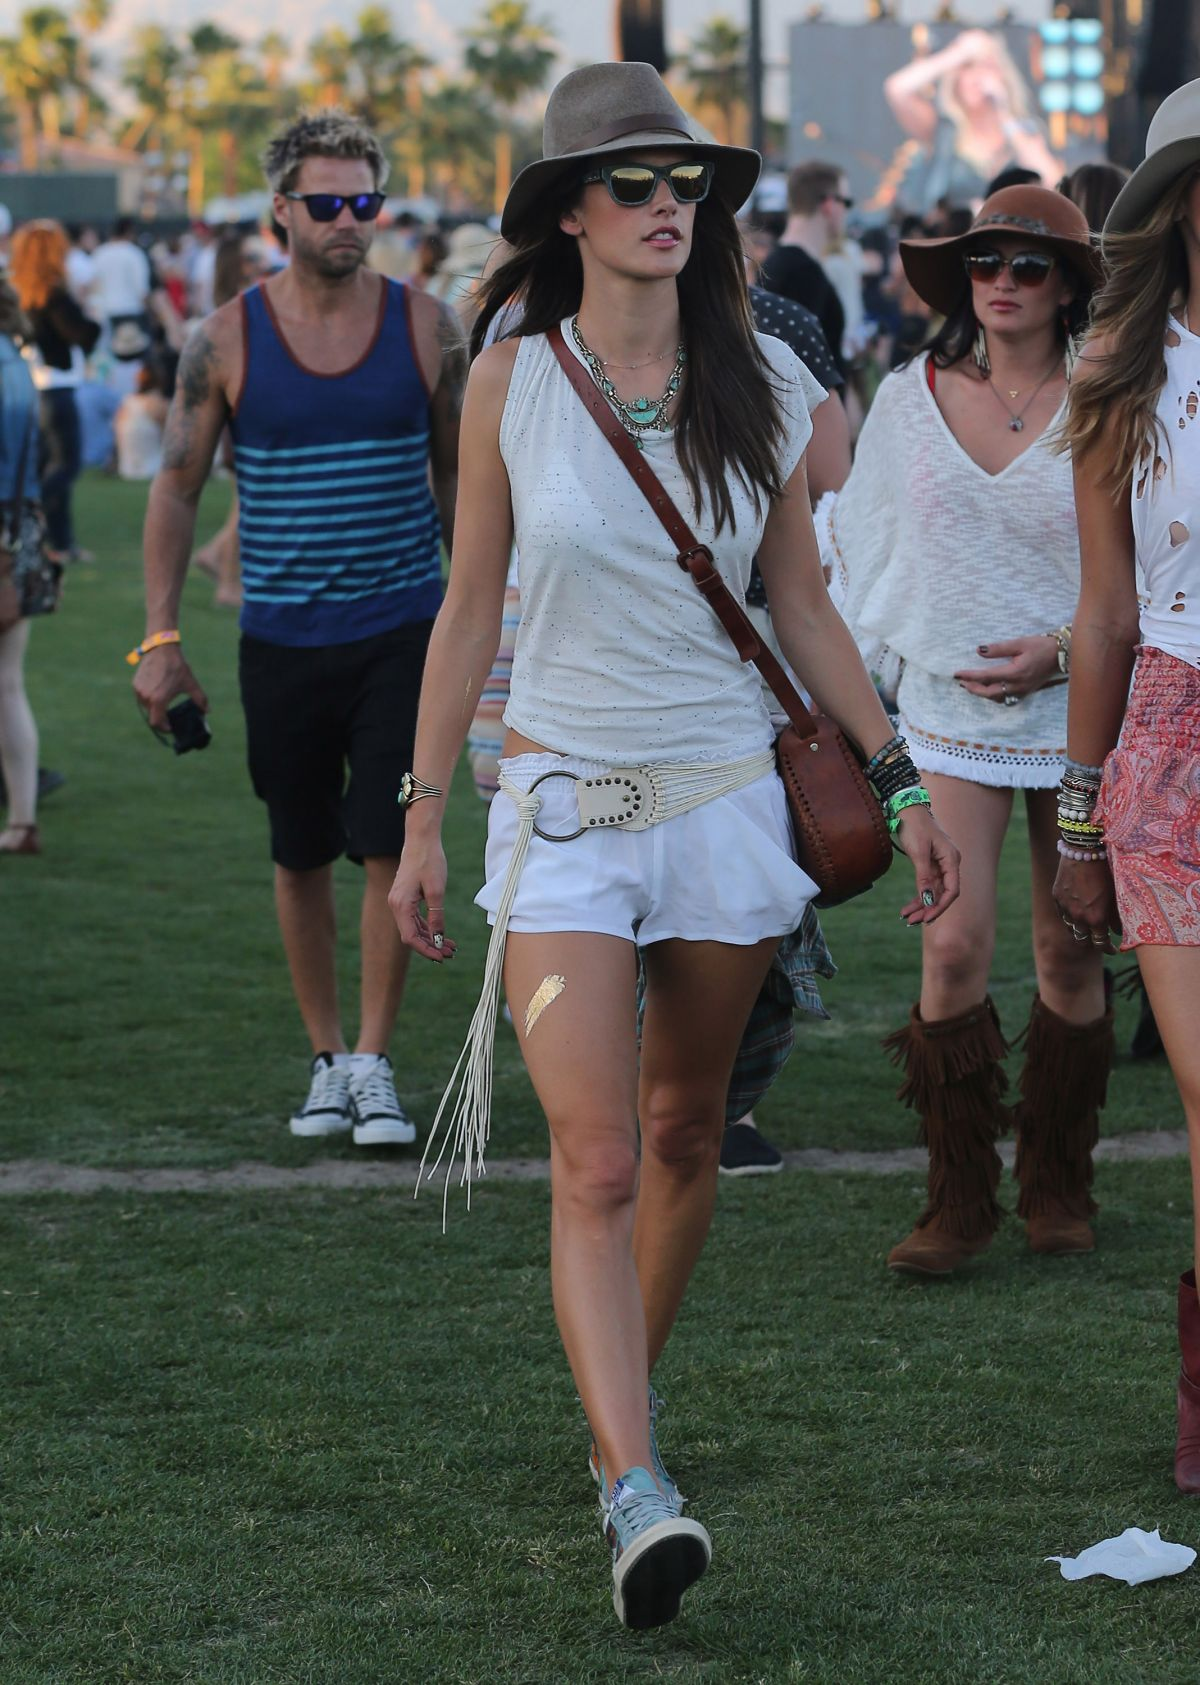 Ambrosio at 2014 Coachella